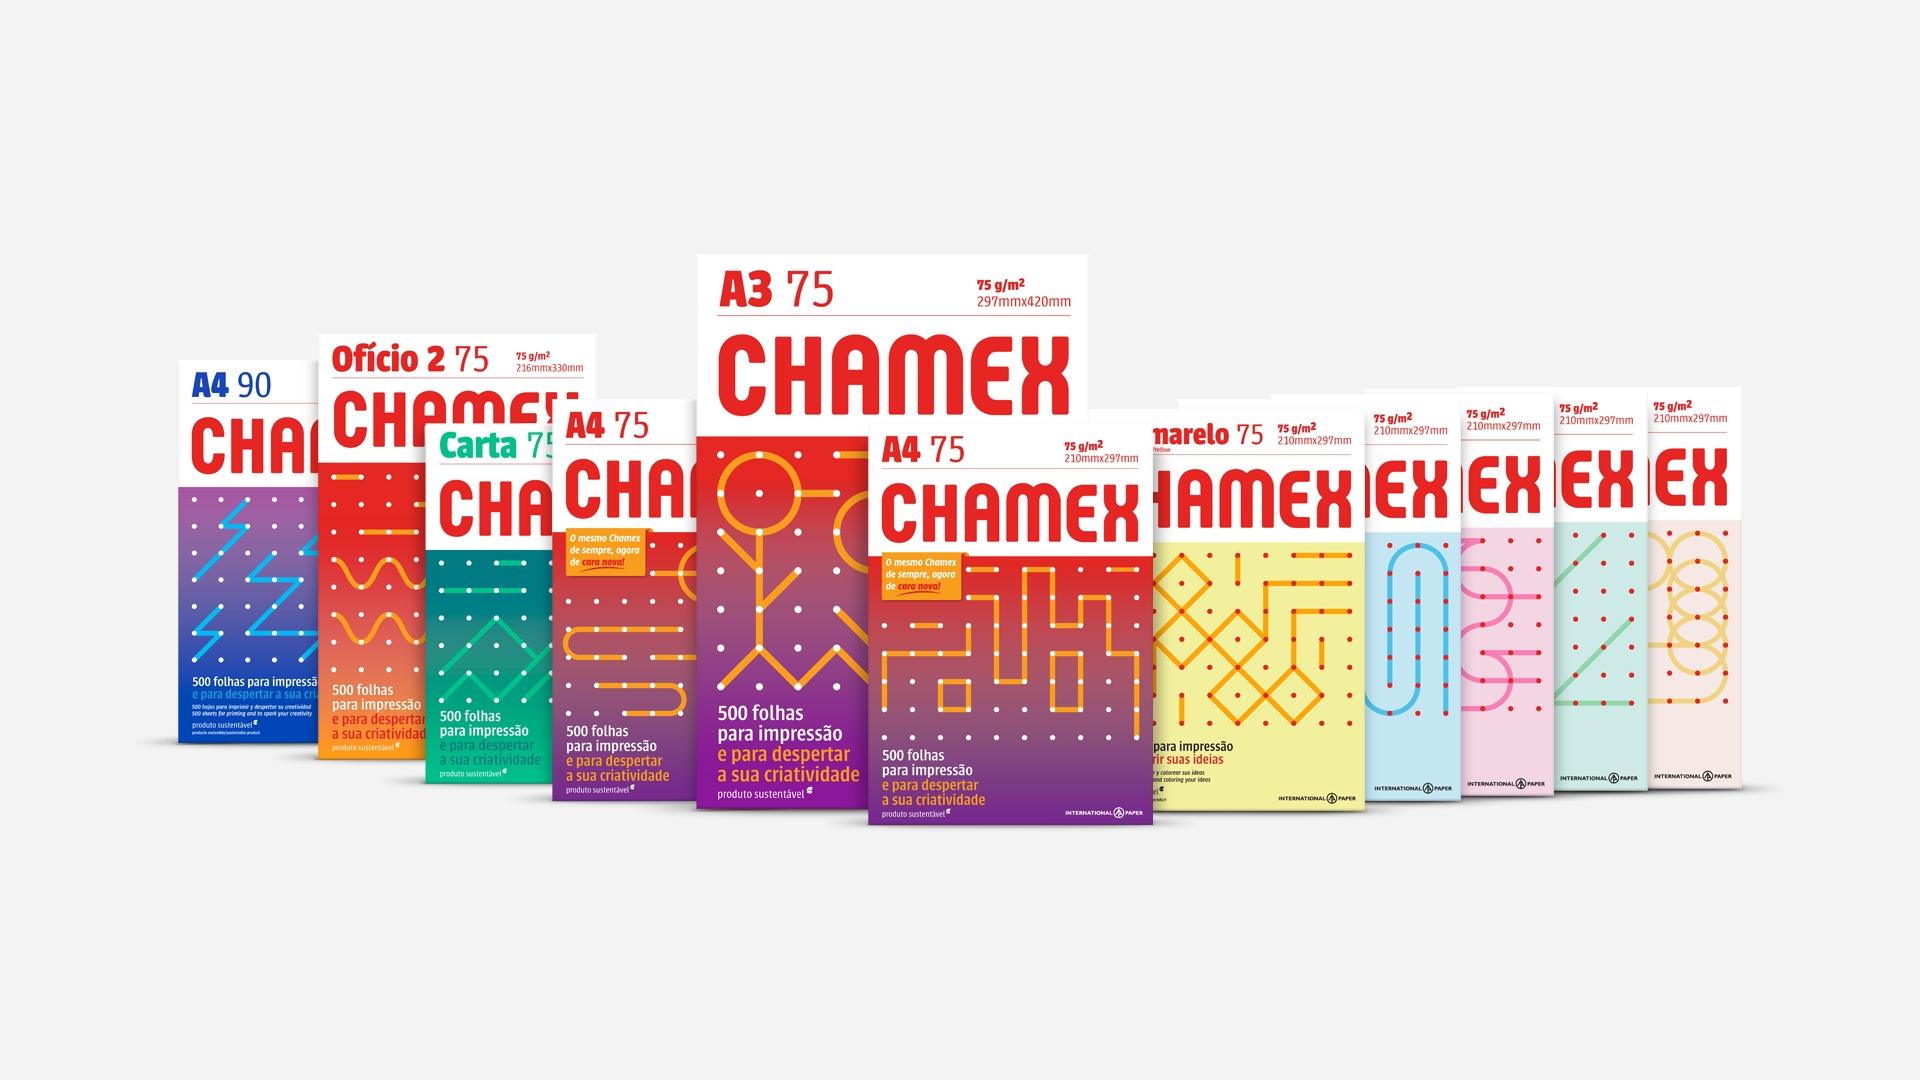 Chamex Adota Nova Identidade Visual Embalagemmarca